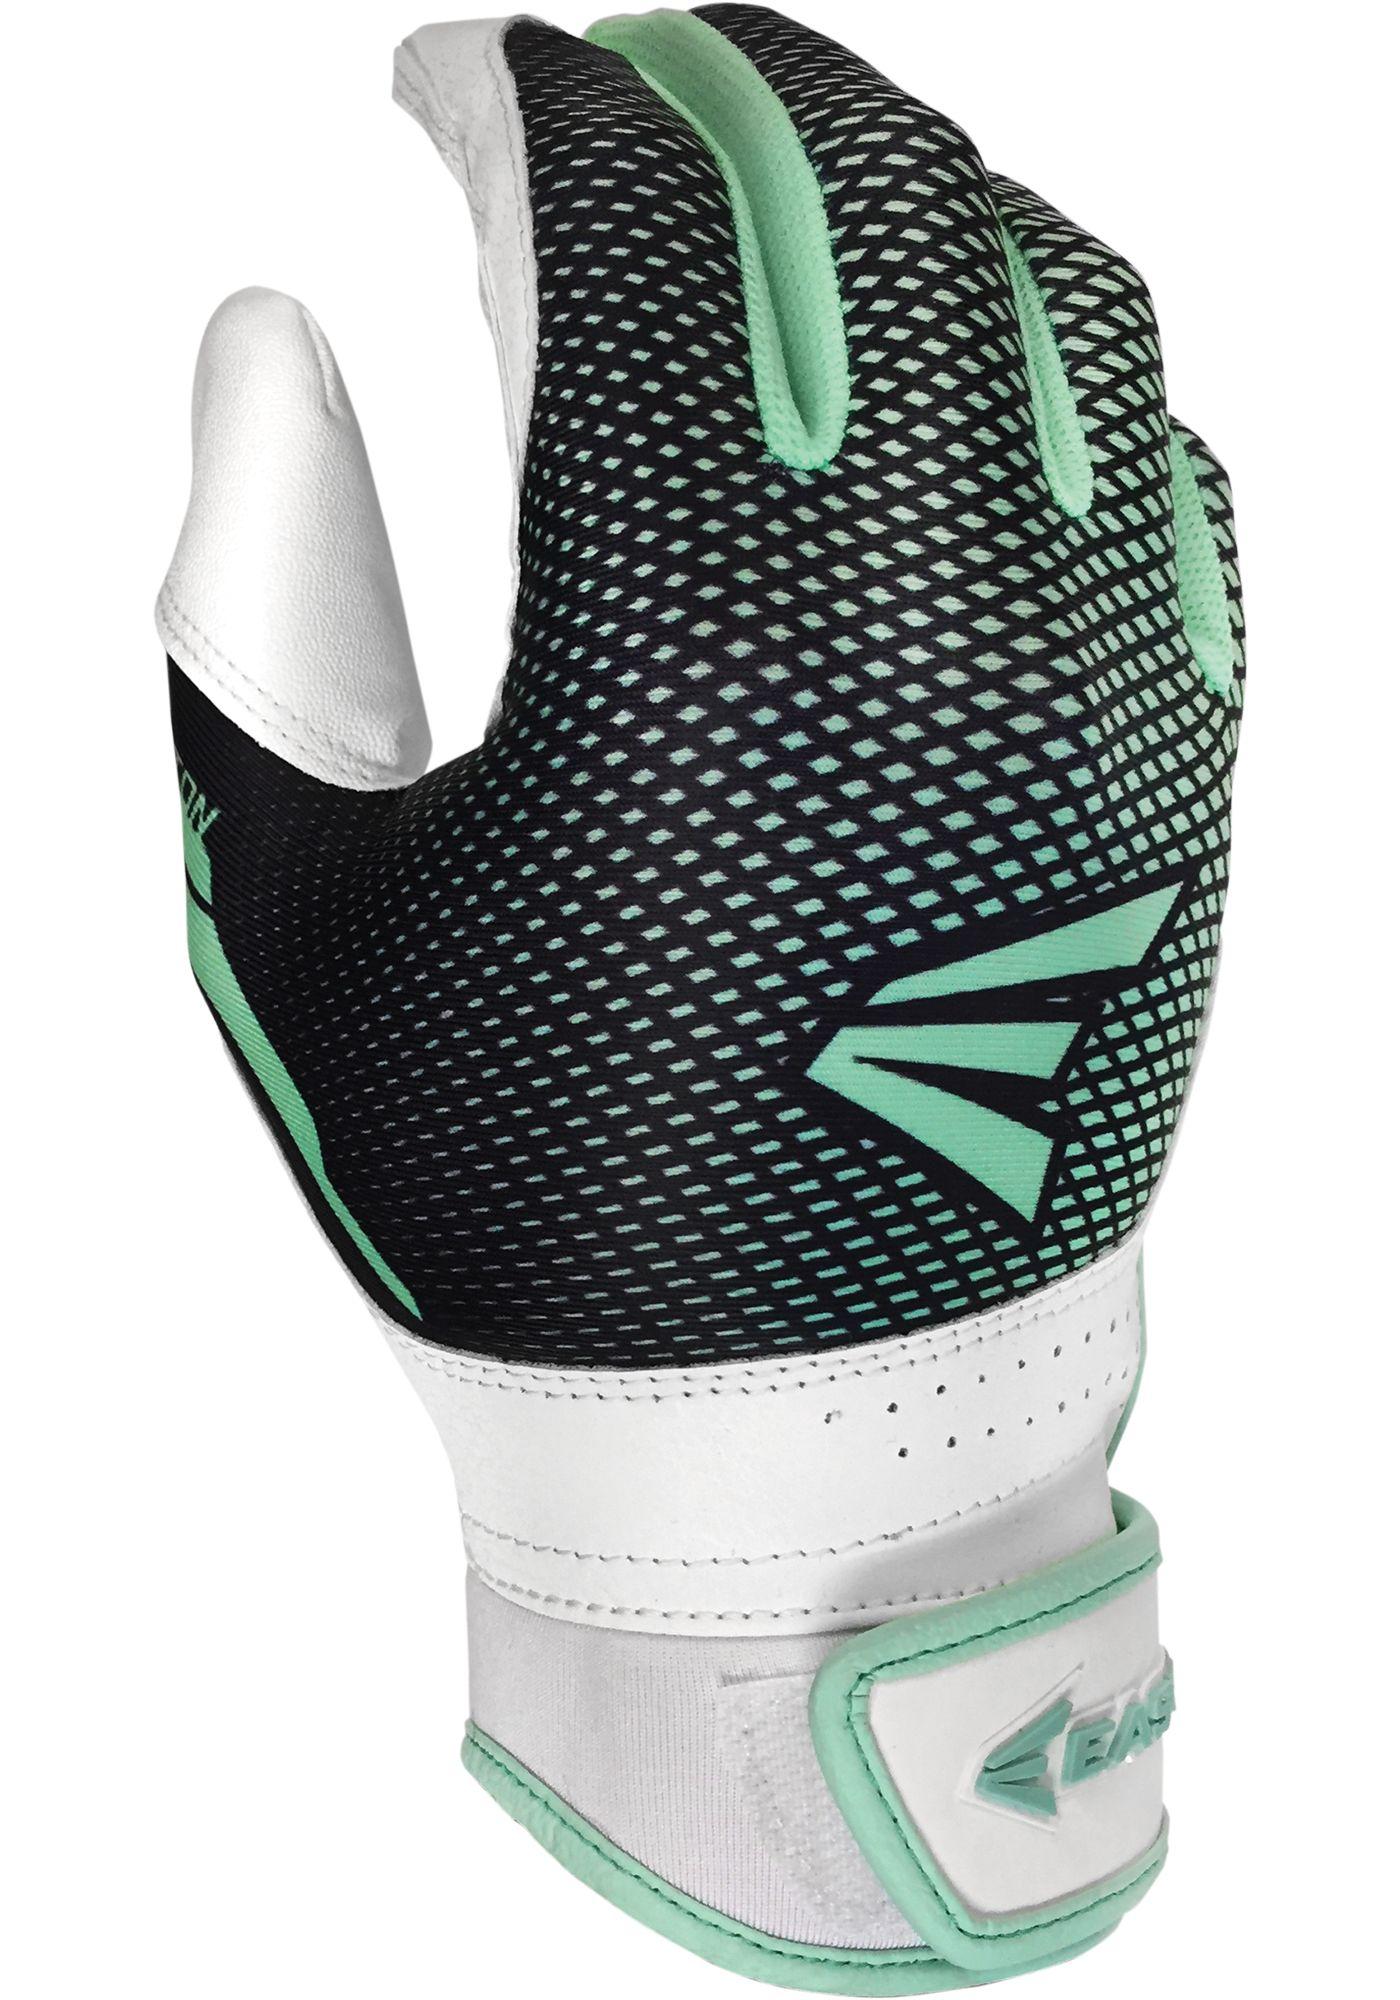 Easton Women's Hyperlite Fastpitch Batting Gloves